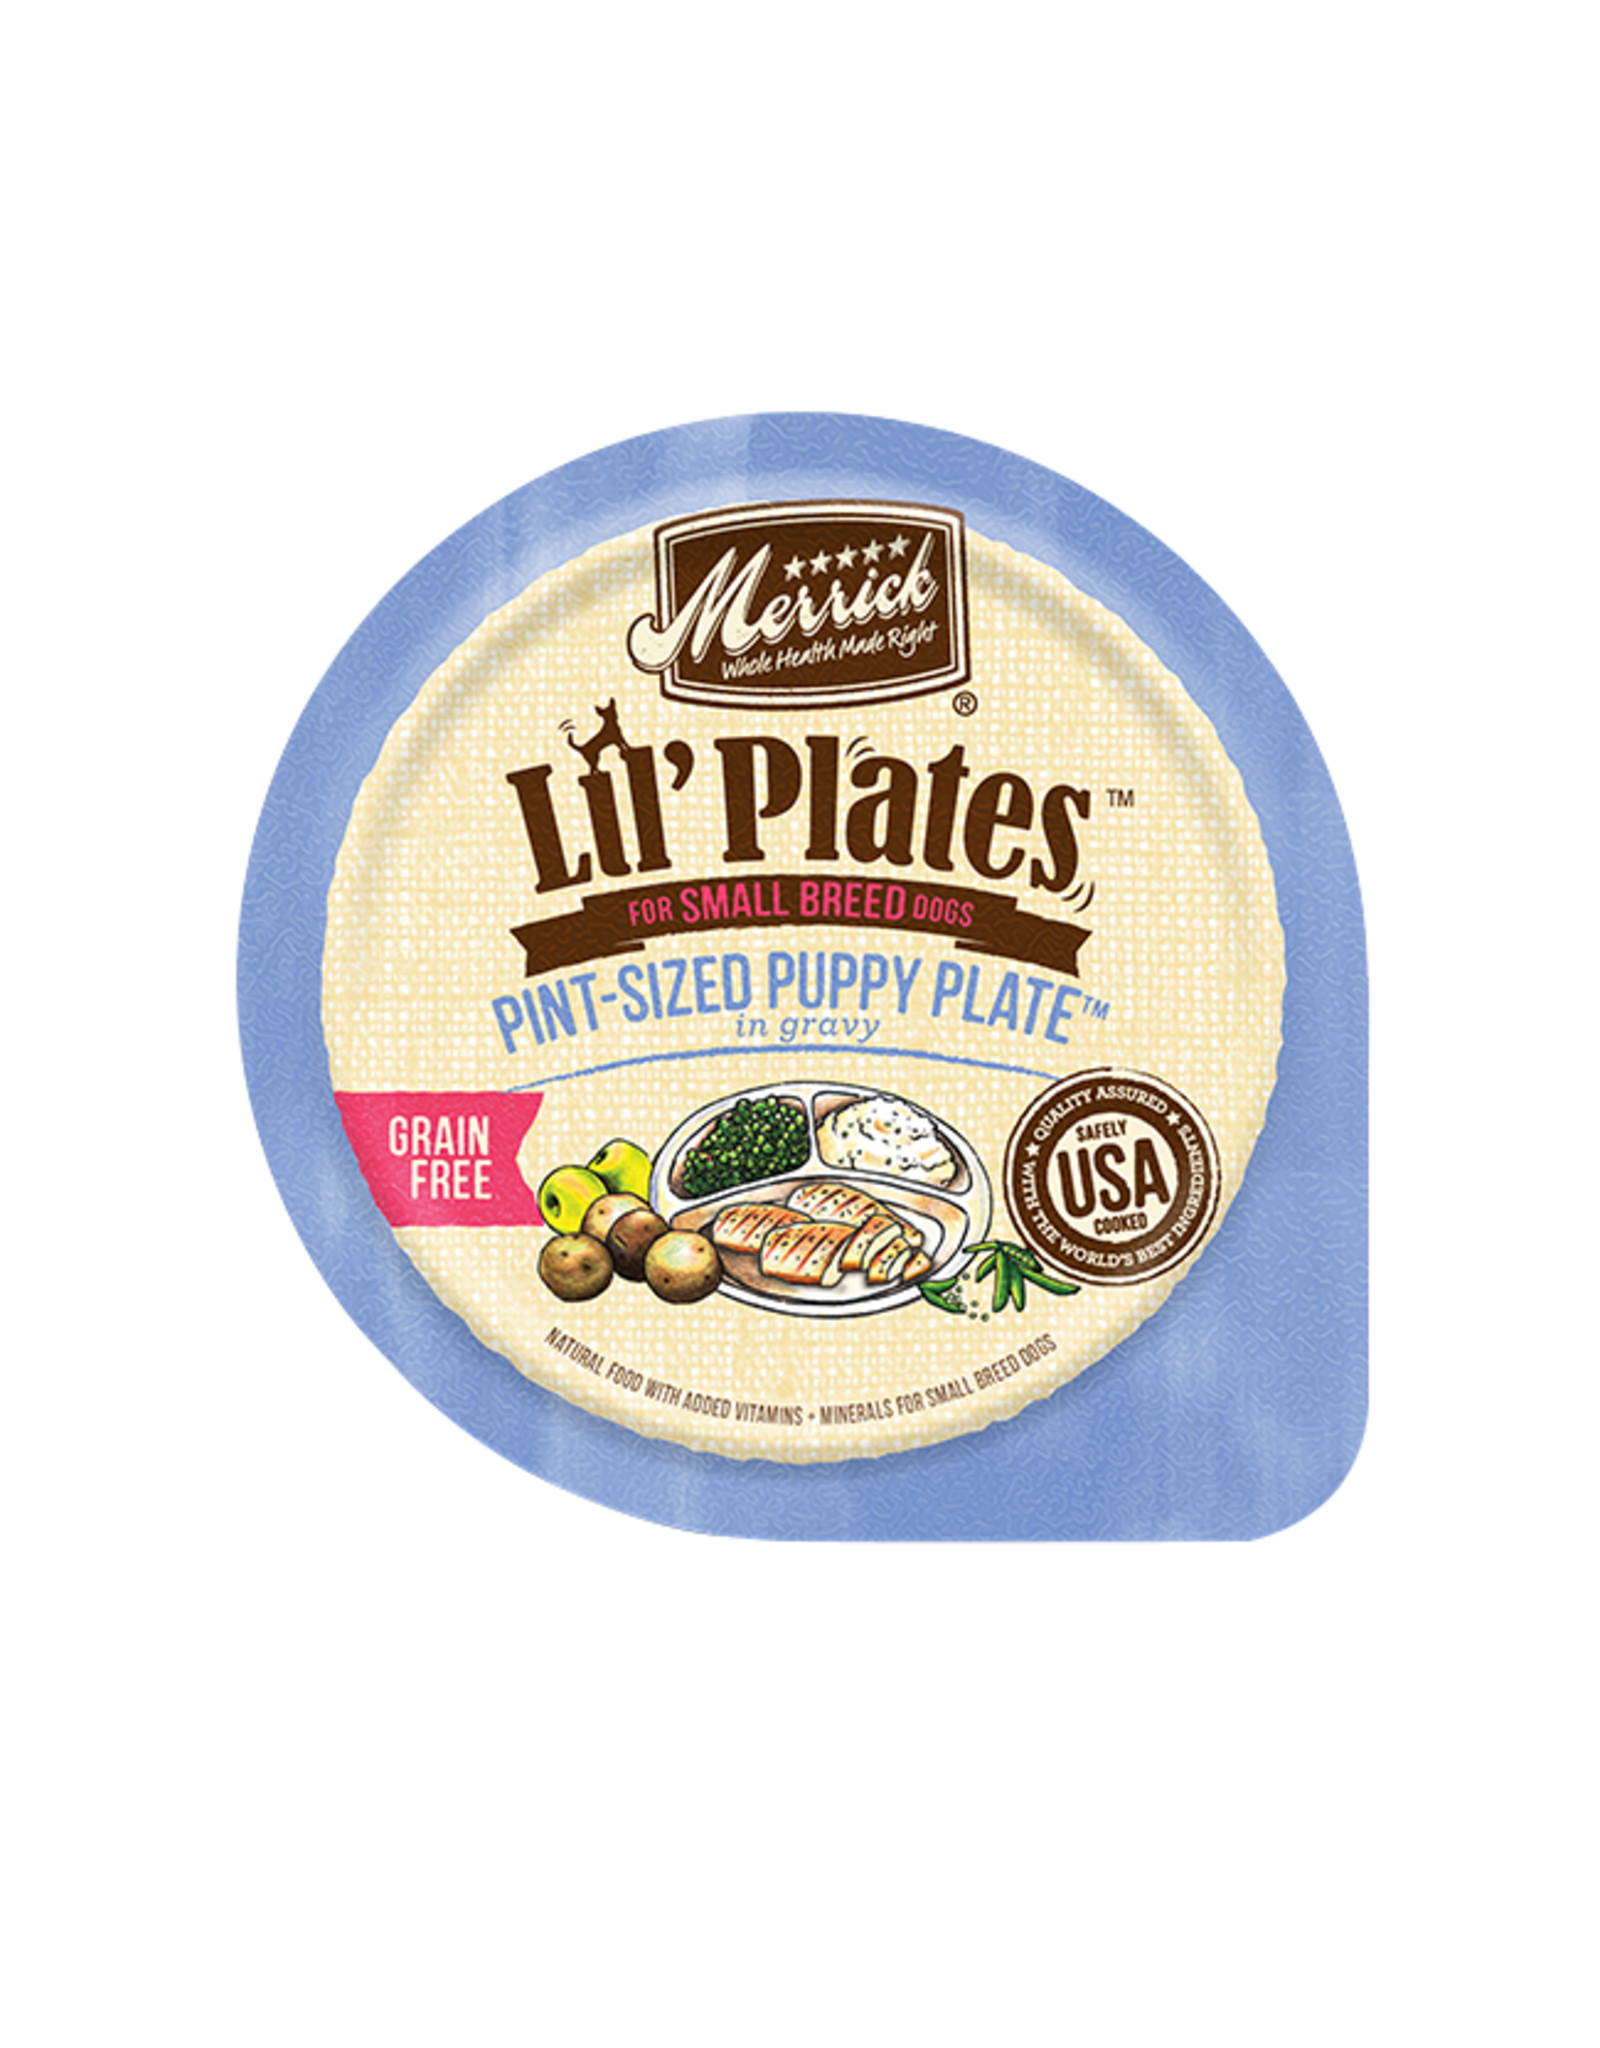 Merrick Merrick Lil' Plates GF Tiny Puppy 3.5oz